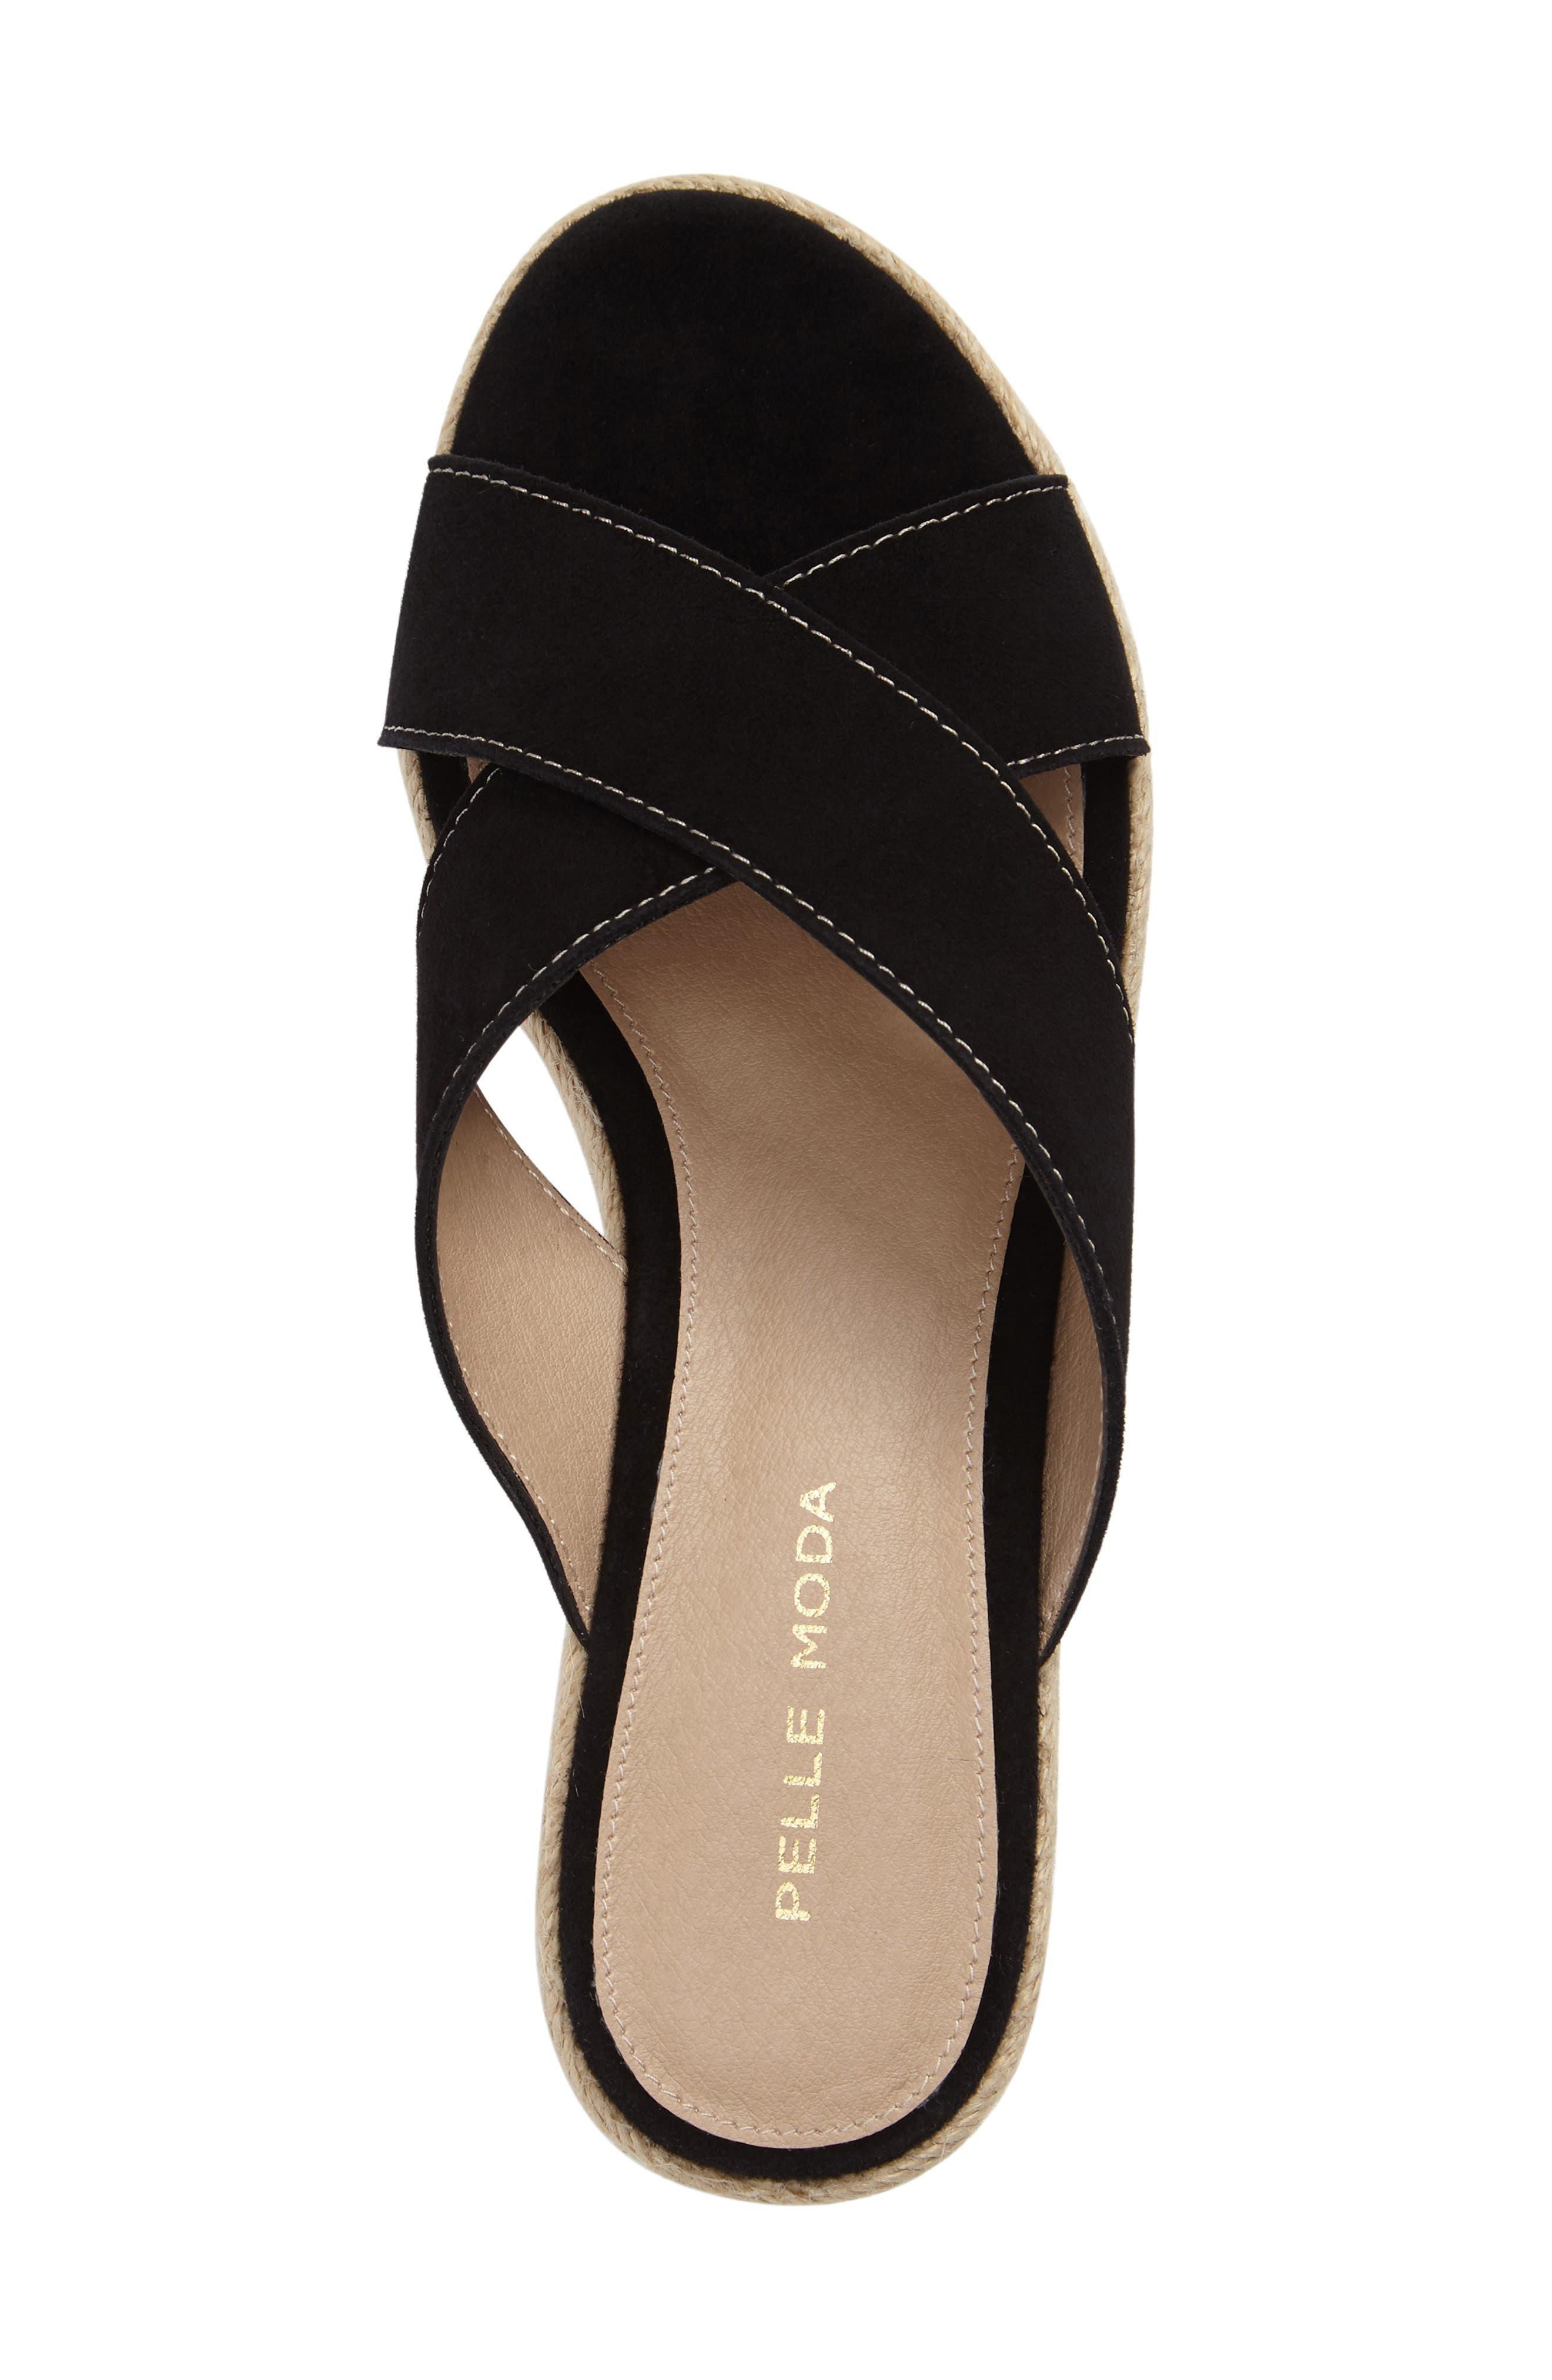 Harriet Platform Wedge Sandal,                             Alternate thumbnail 5, color,                             001